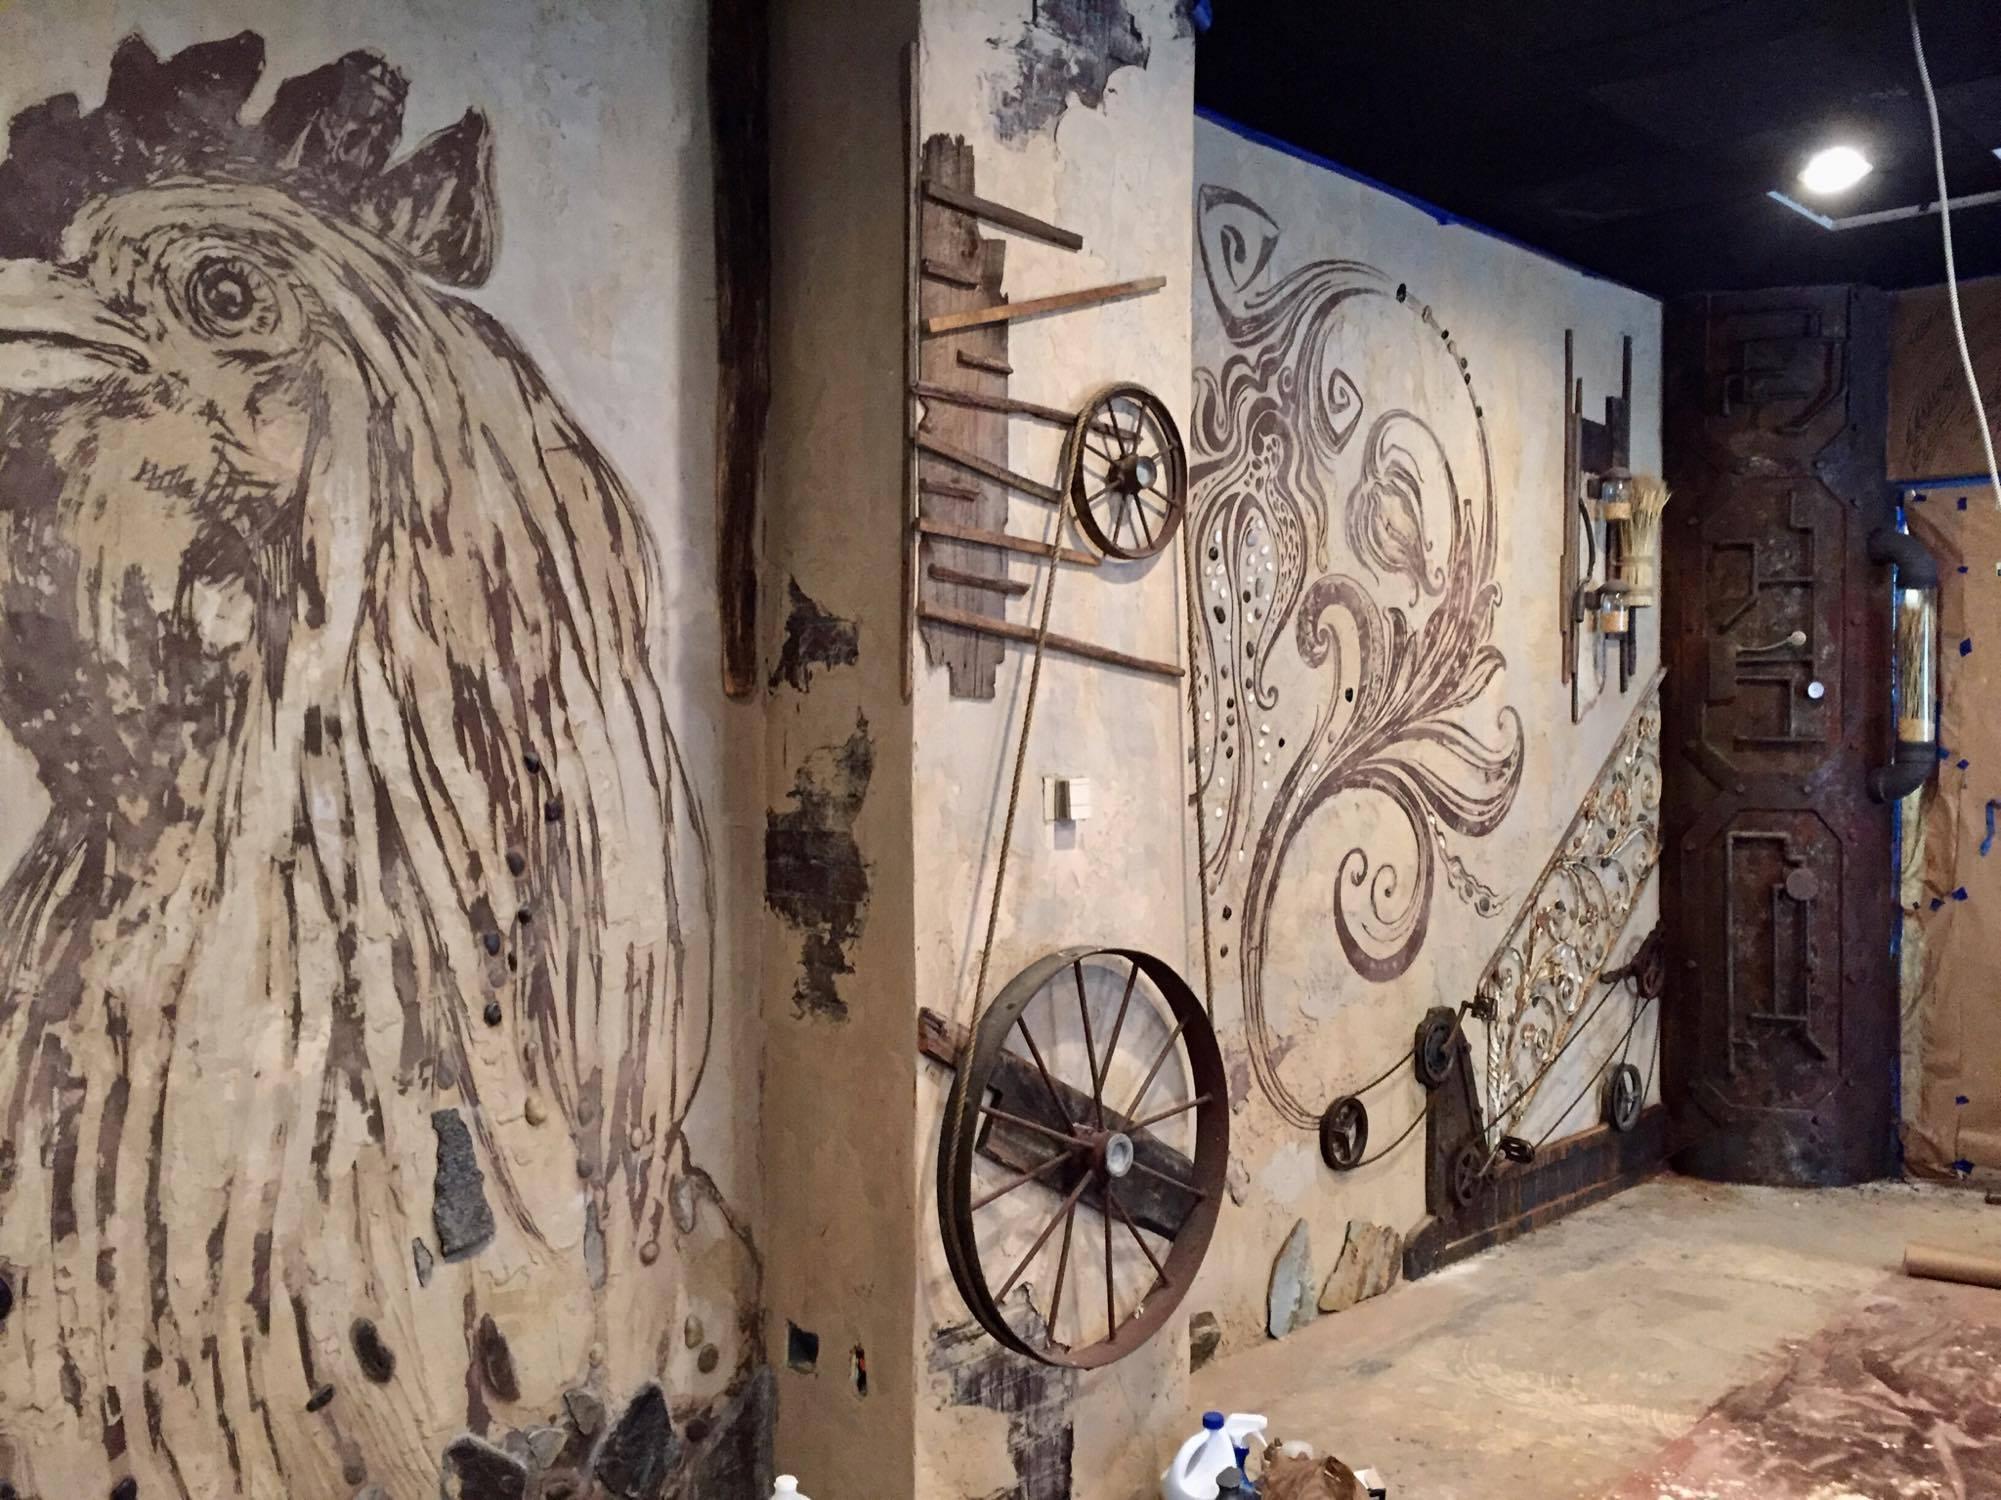 A Back Room Mural